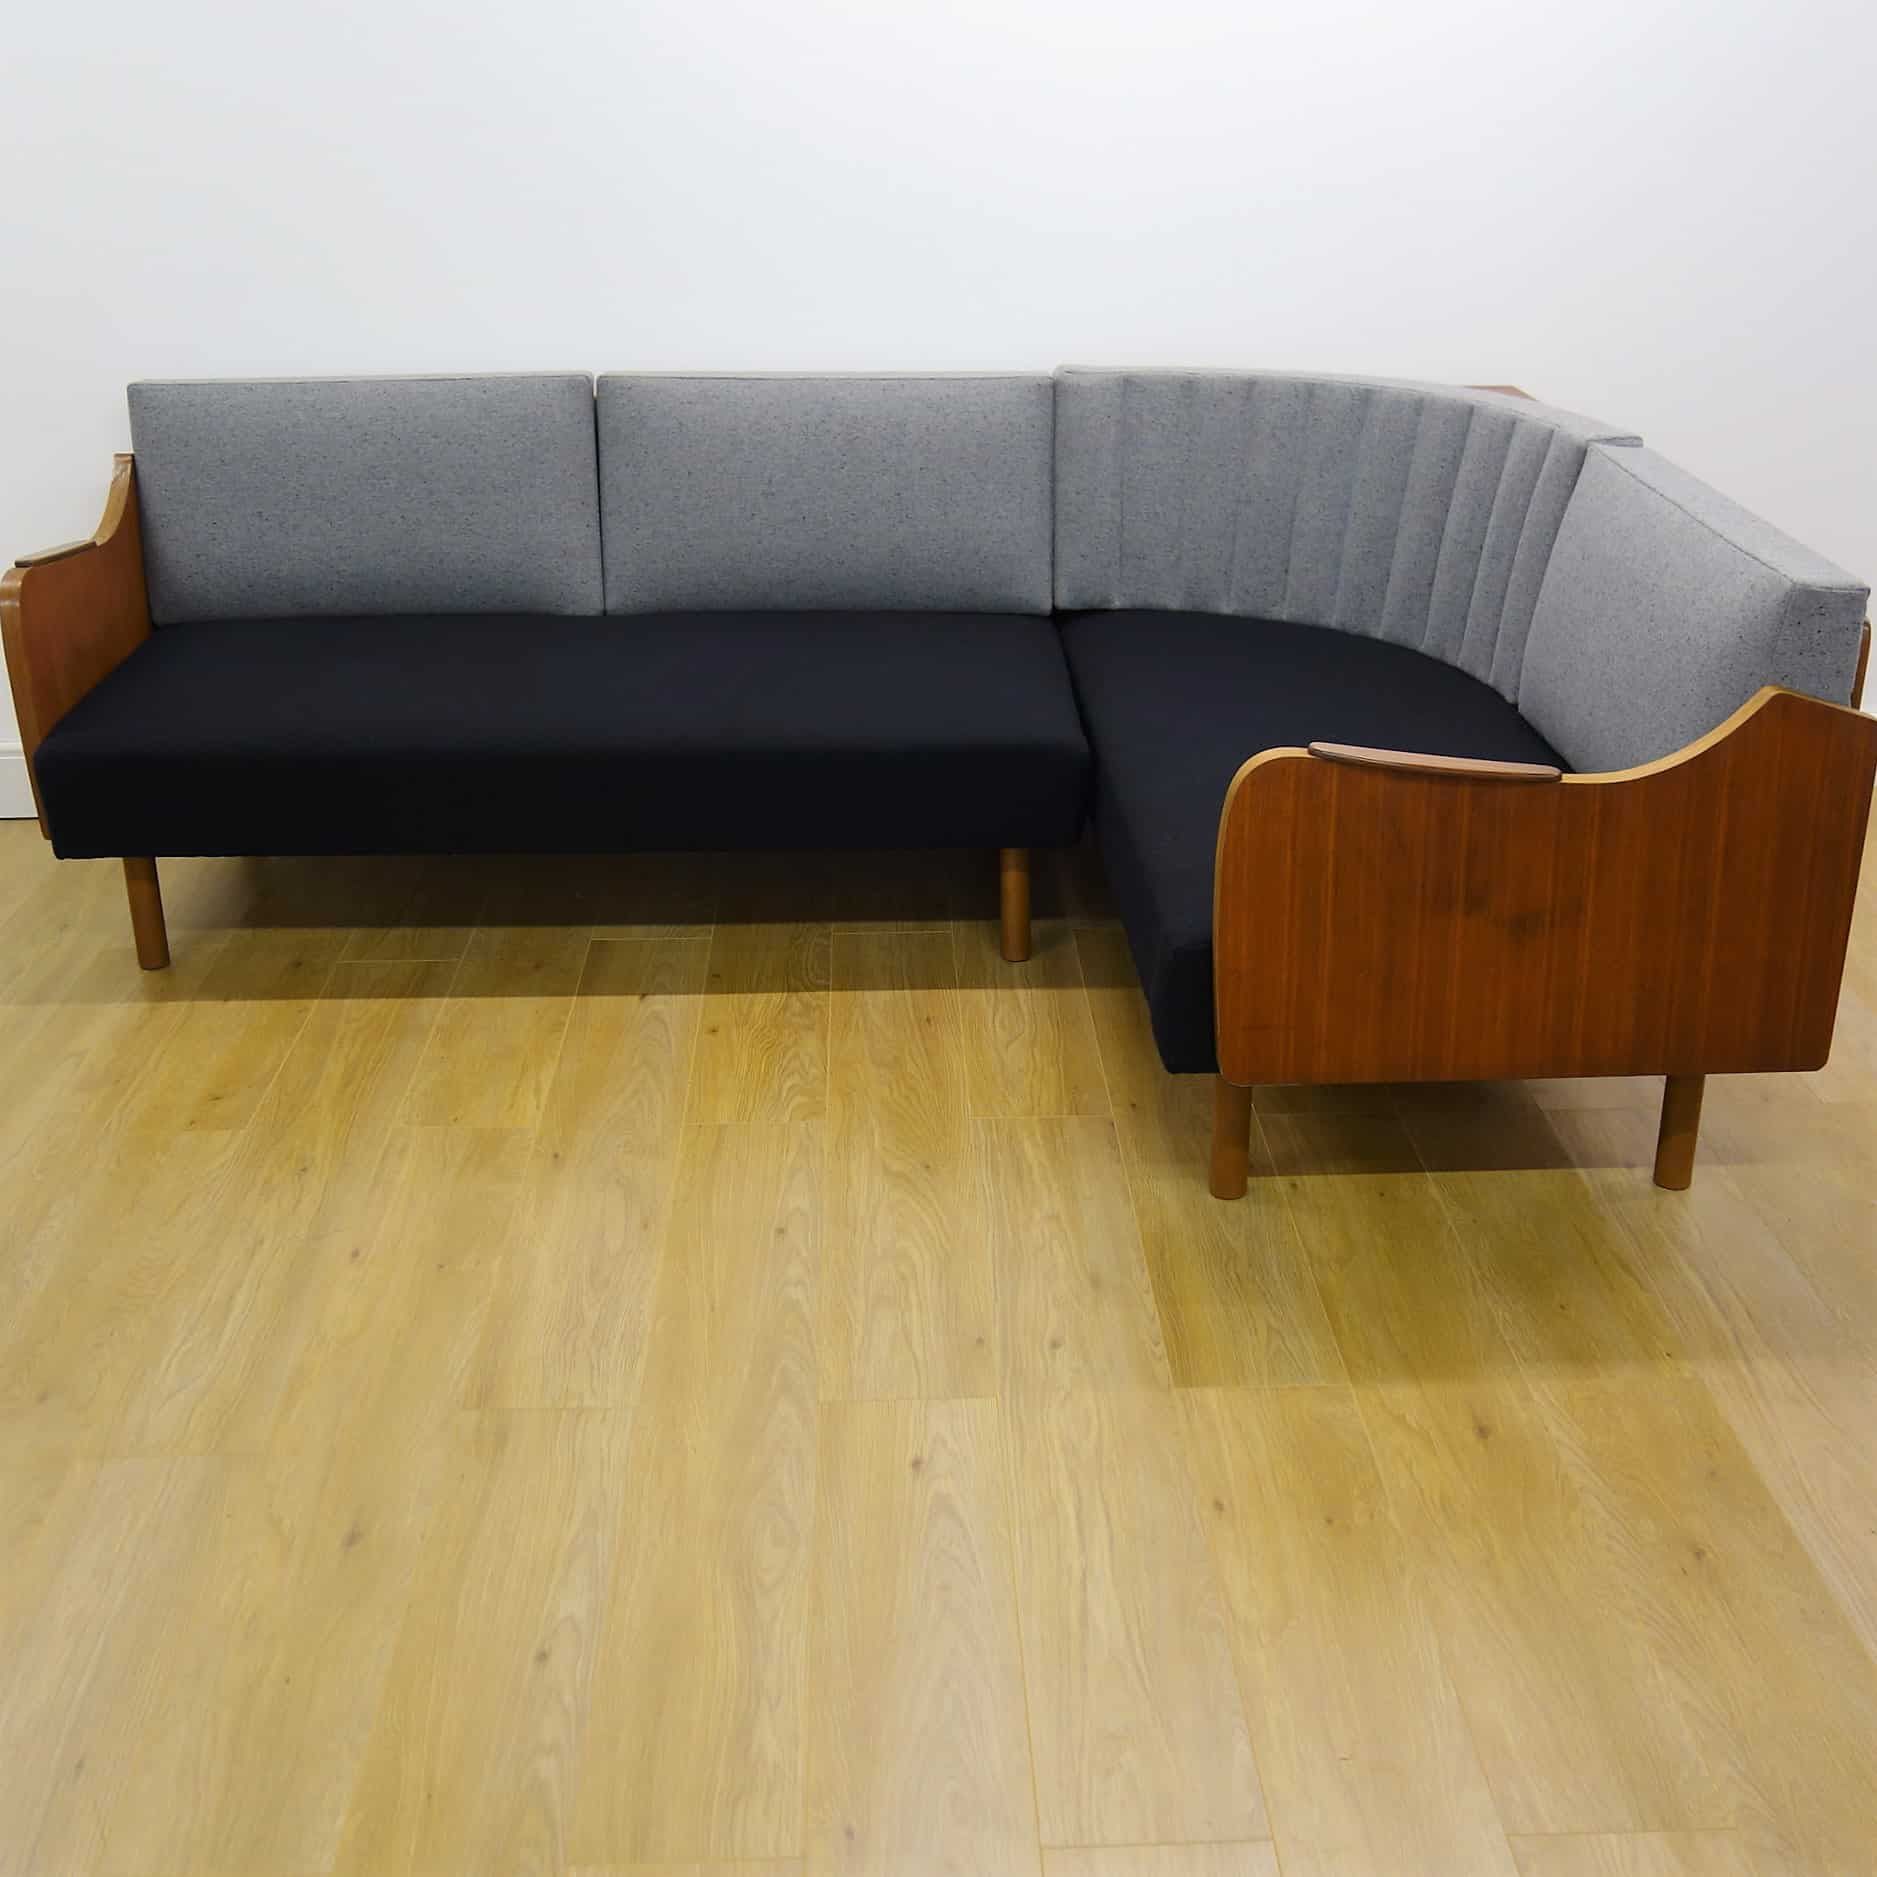 danish style sofa bed uk phoenix large recliner 1960s teak corner day mark parrish mid